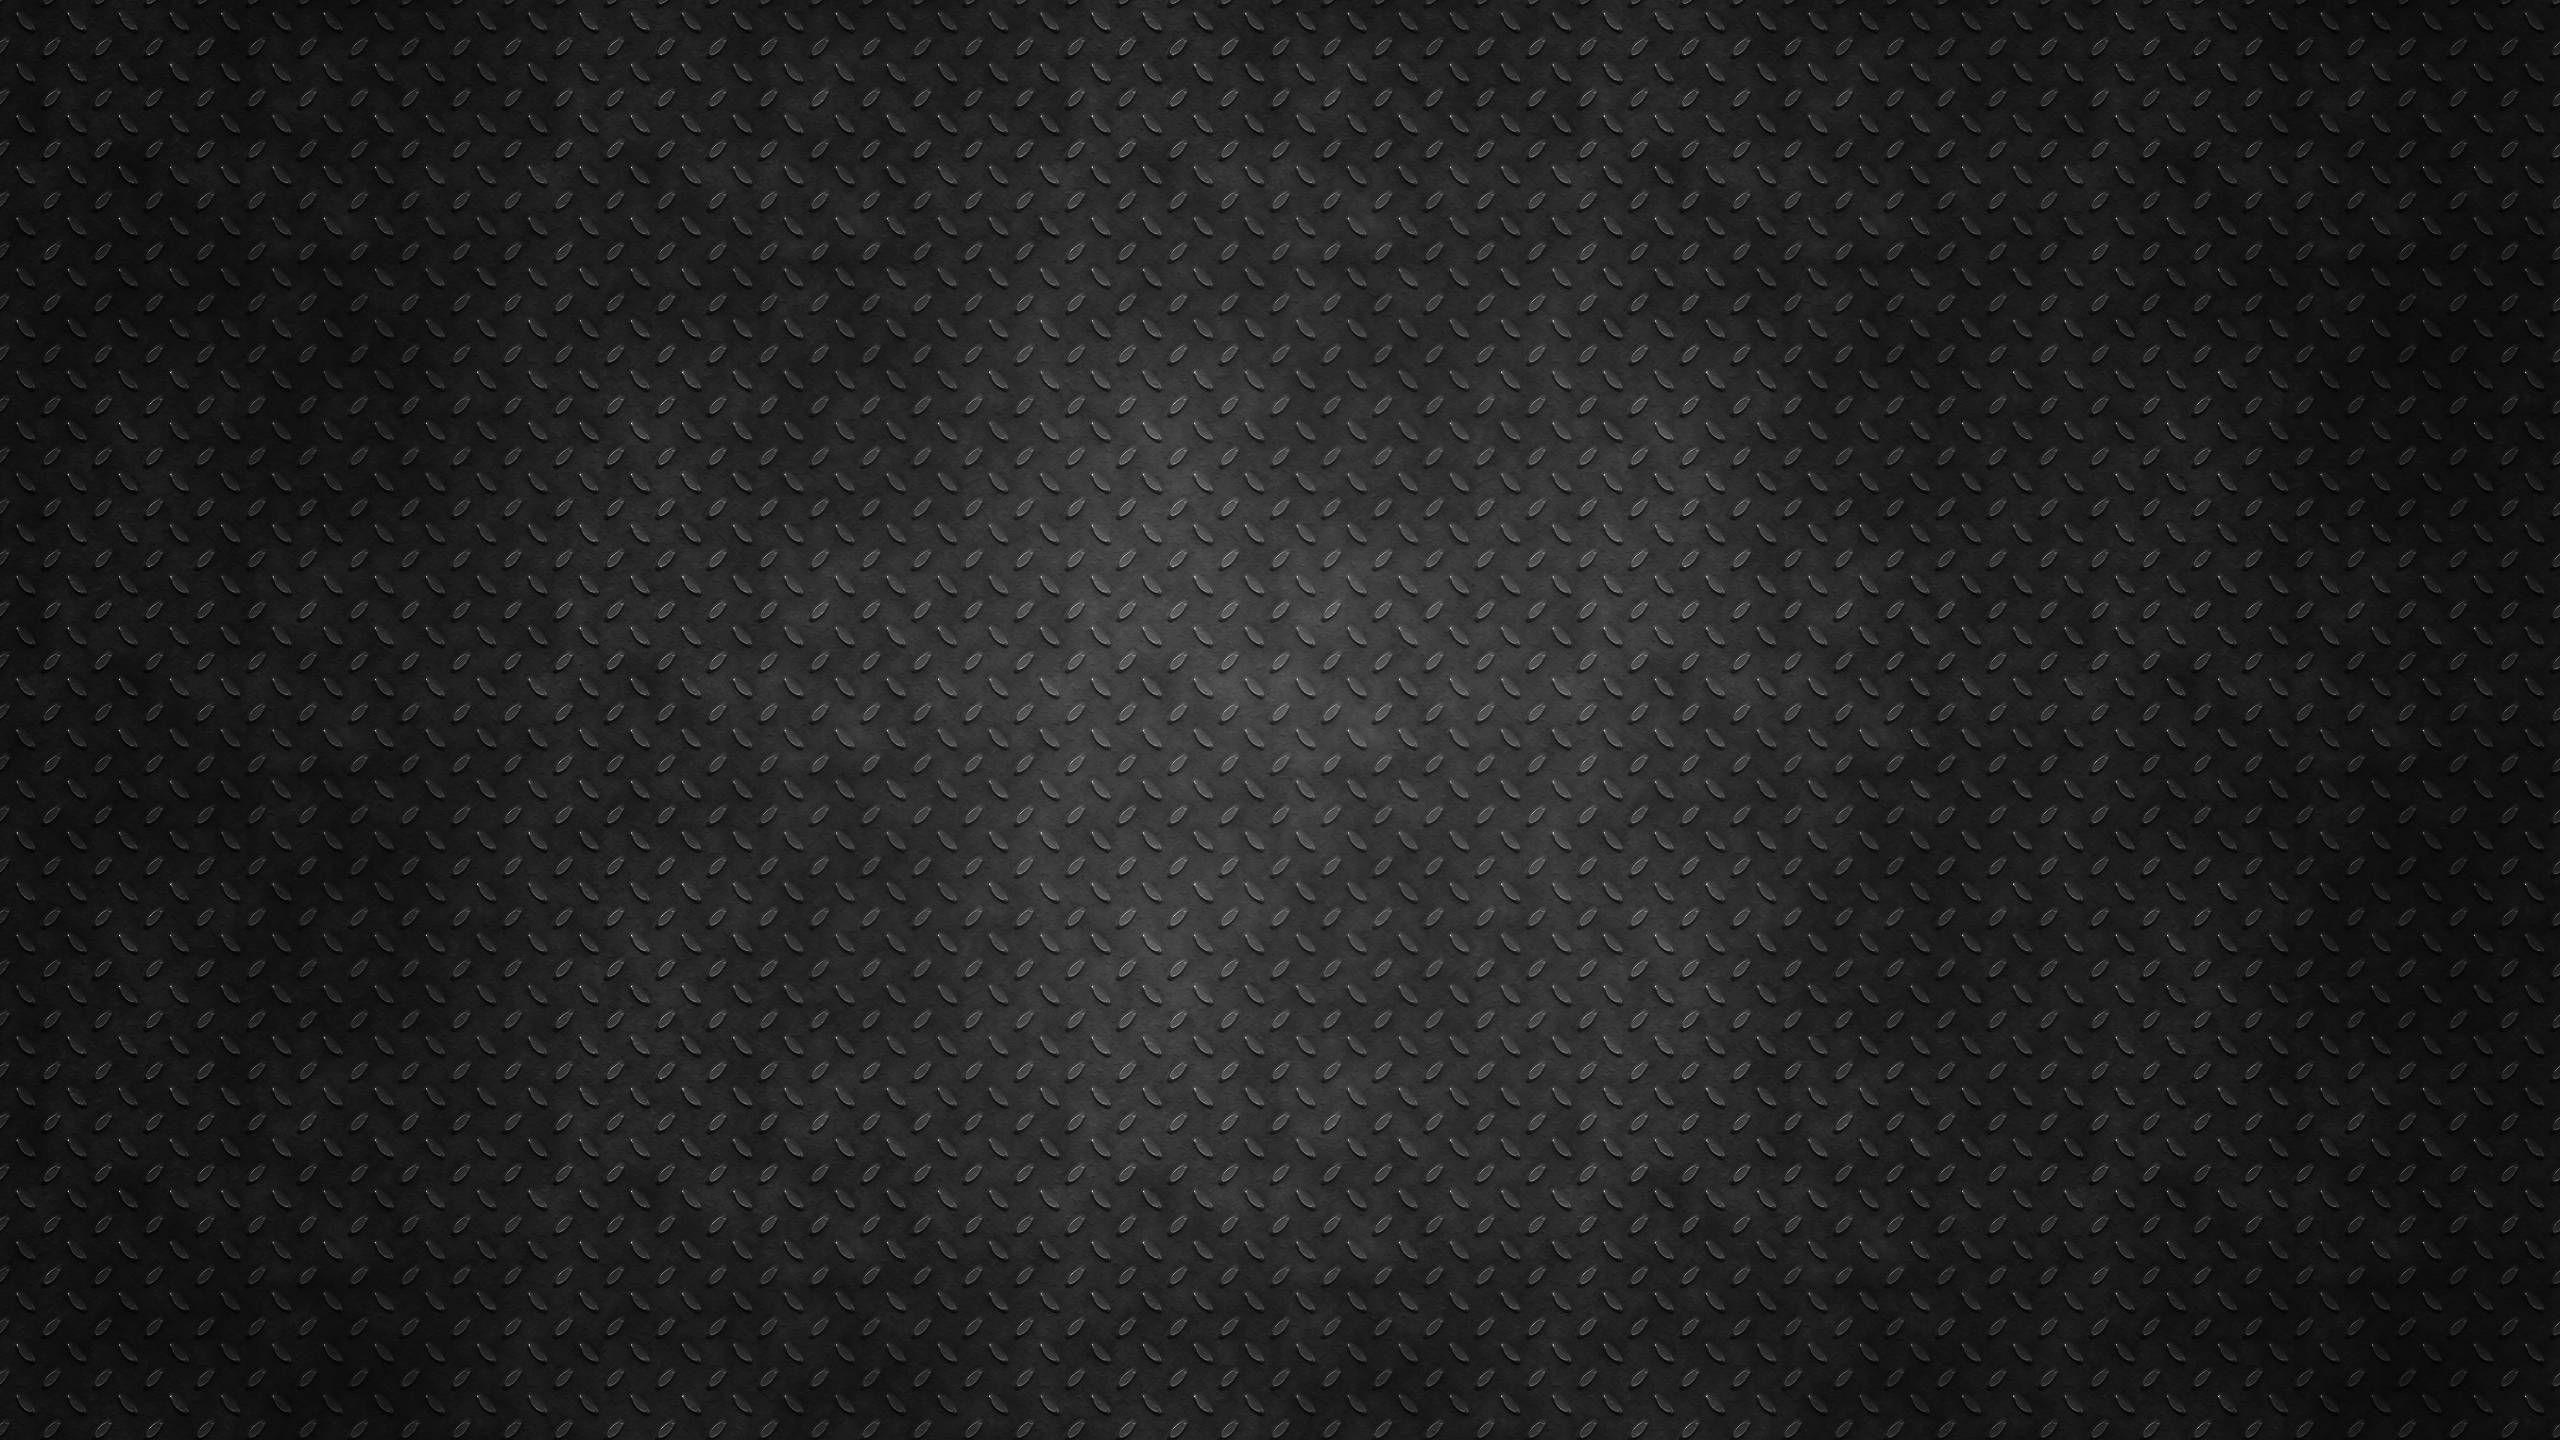 Fantastic Wallpaper Macbook Grunge - 30fbe413dc67086588ec3067ecc96c54  Collection_74657.jpg